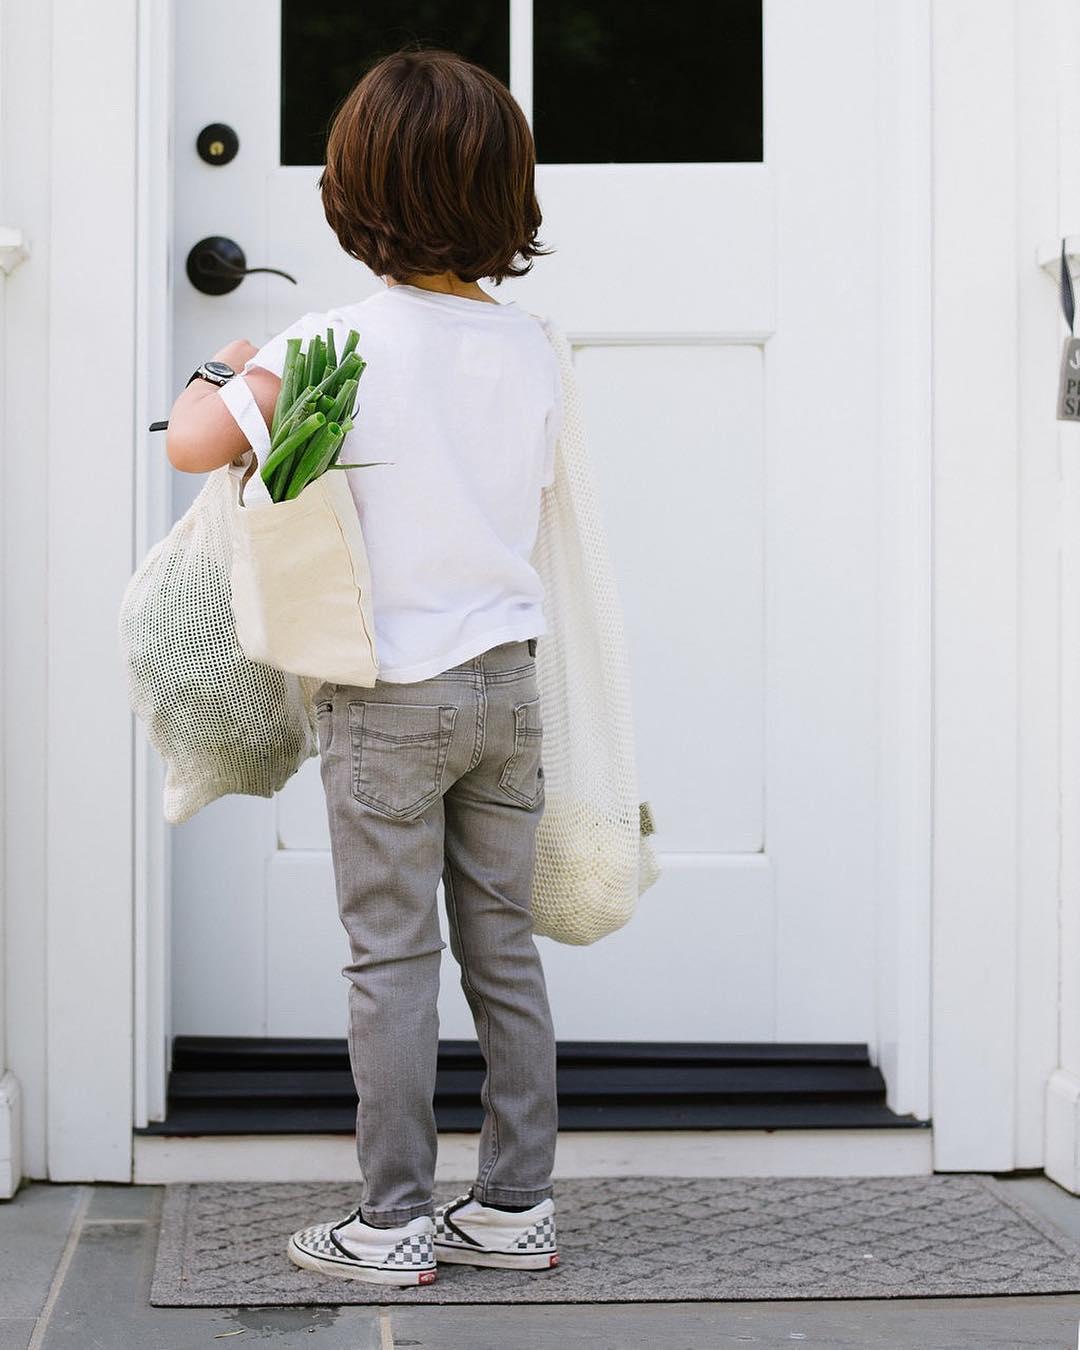 Natasha Beck using reusable bags